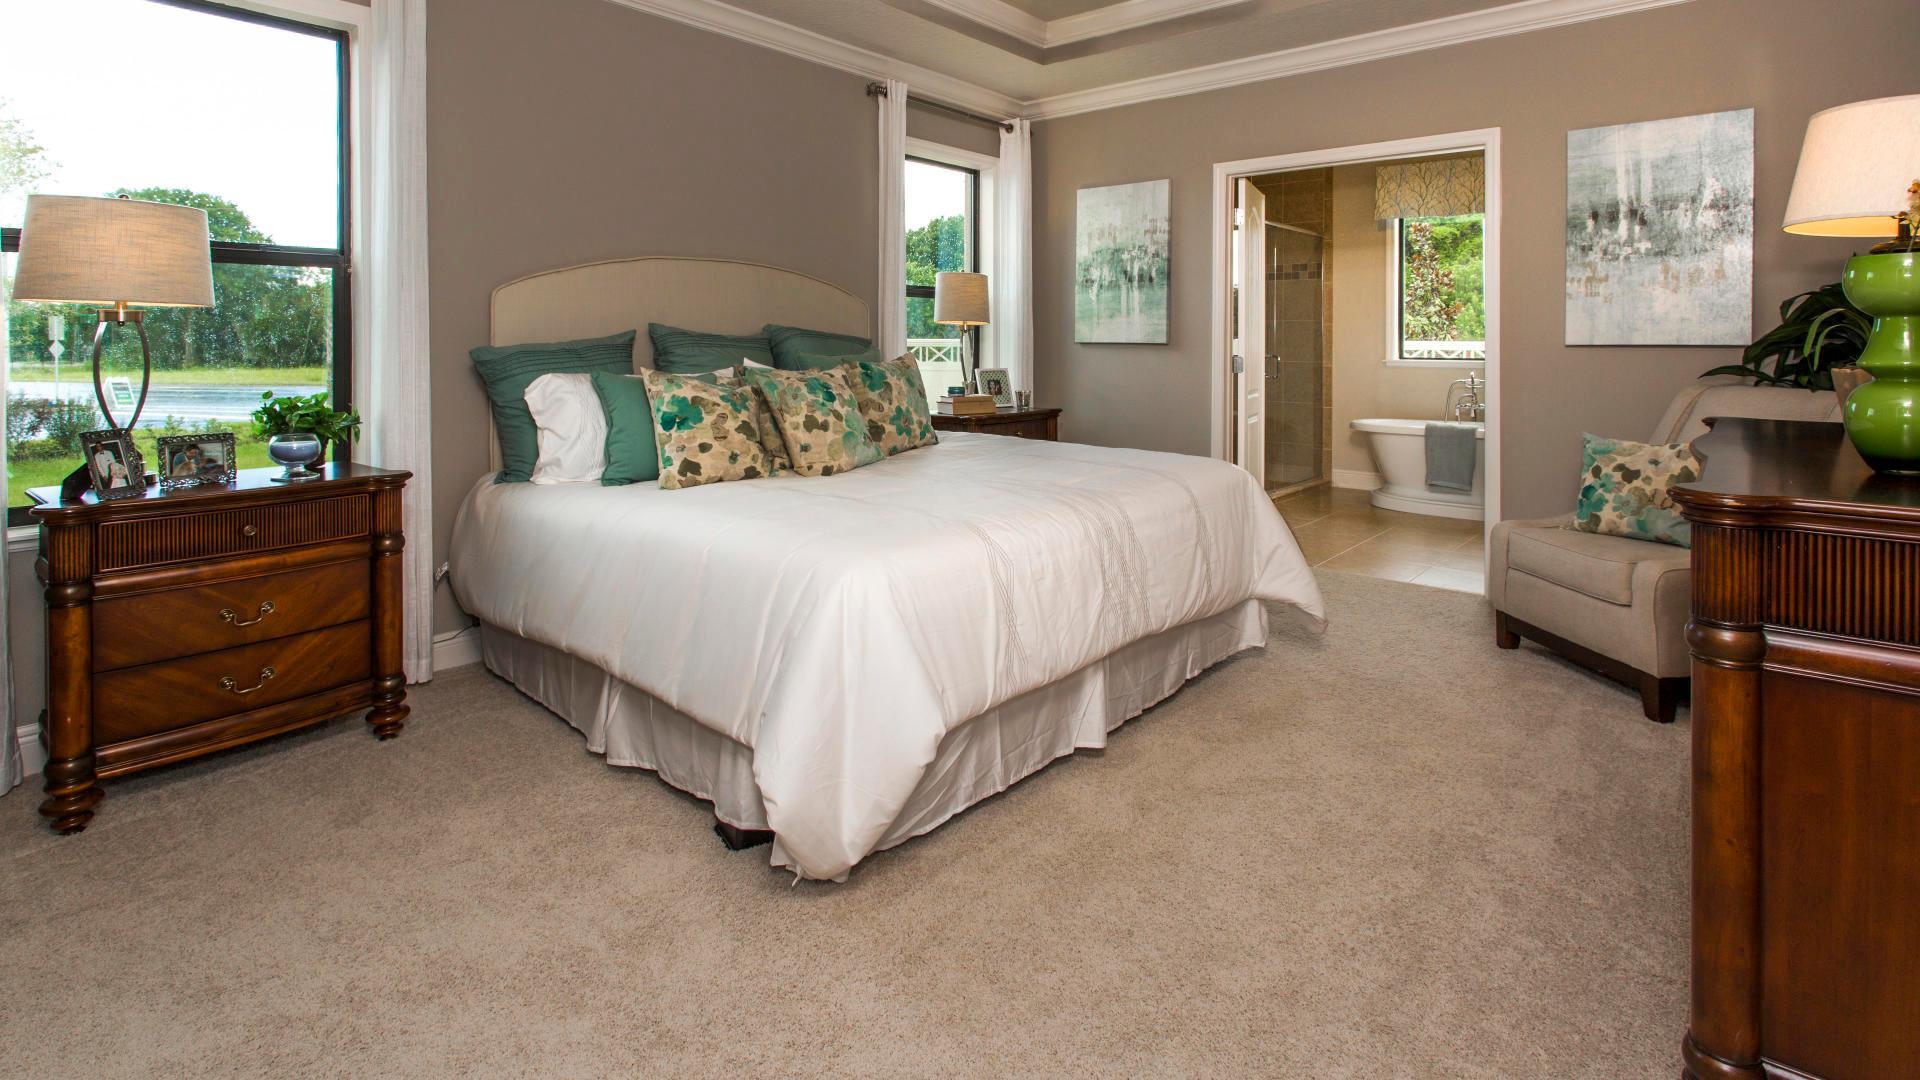 Bedroom featured in the Drexel By Maronda Homes in Daytona Beach, FL